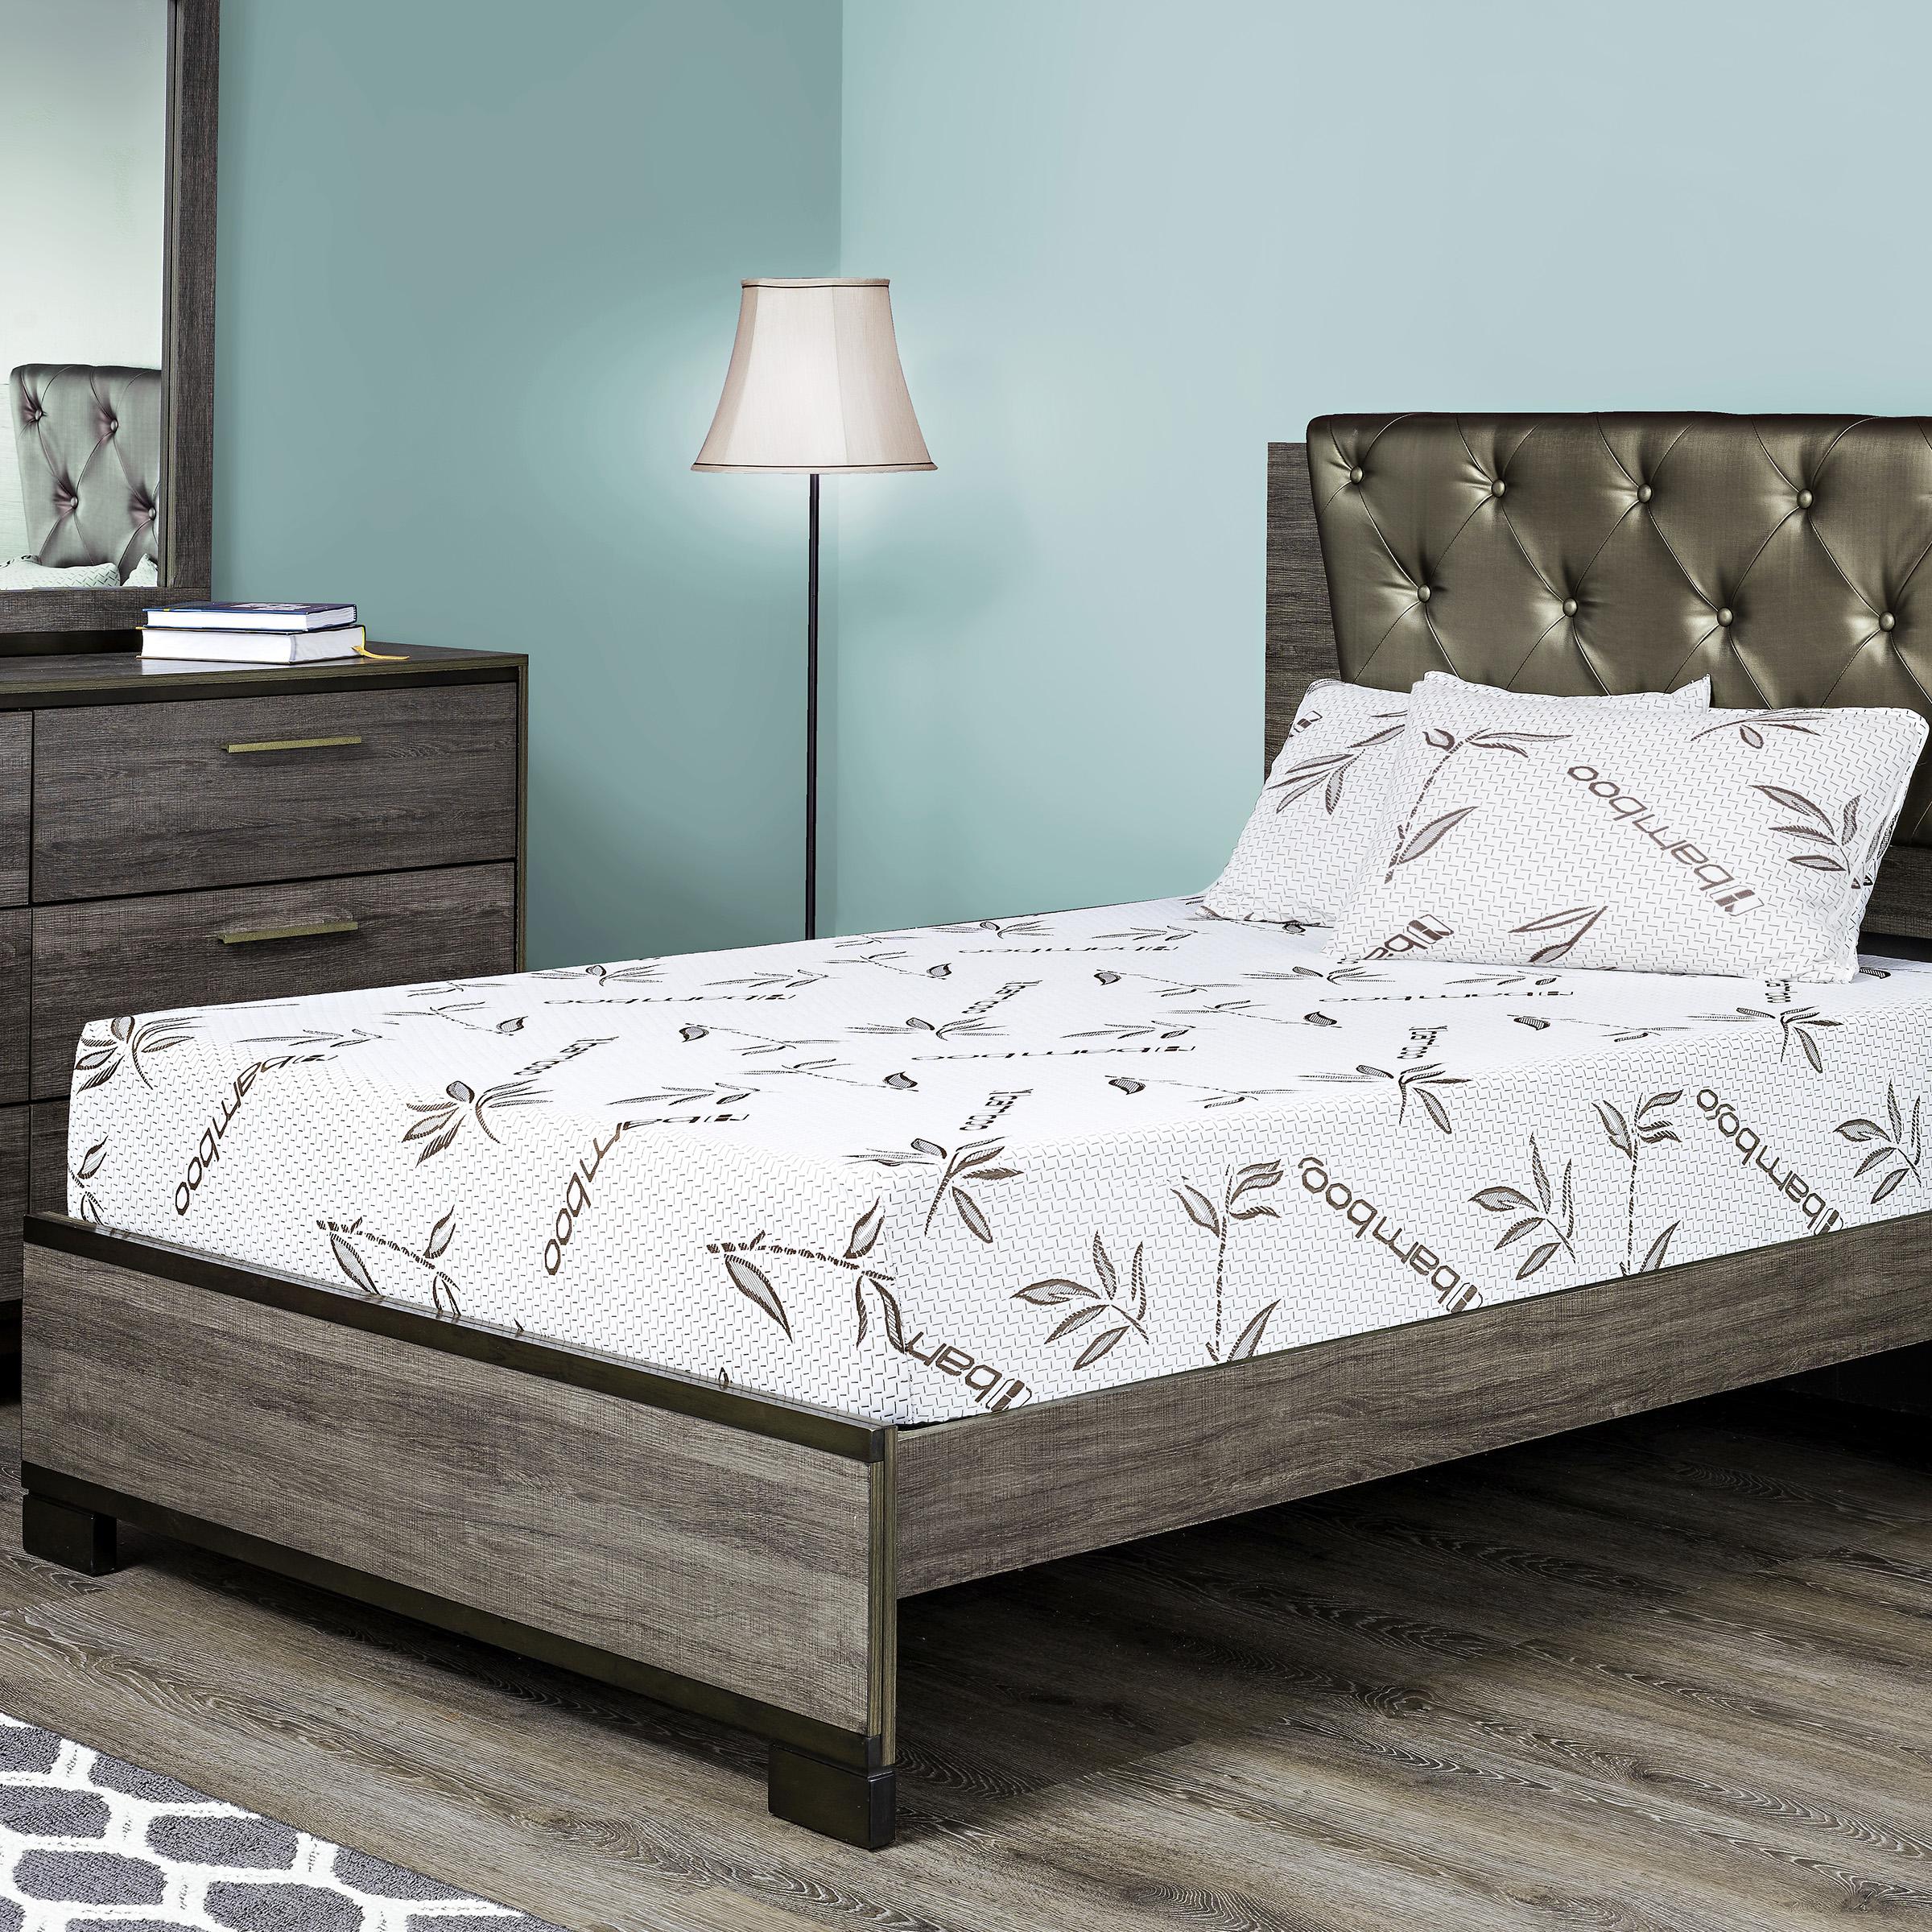 Fortnight Bedding  8 Inch Gel Memory Foam Mattress with B...